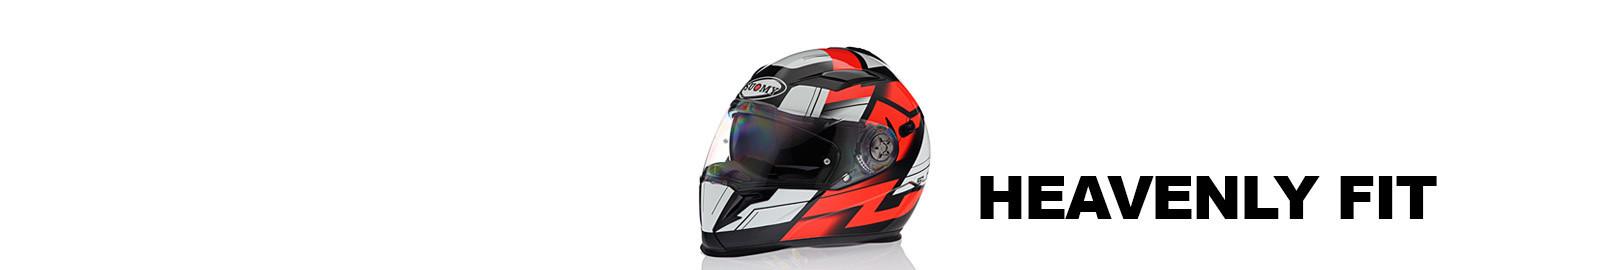 Suomy Halo Helmets